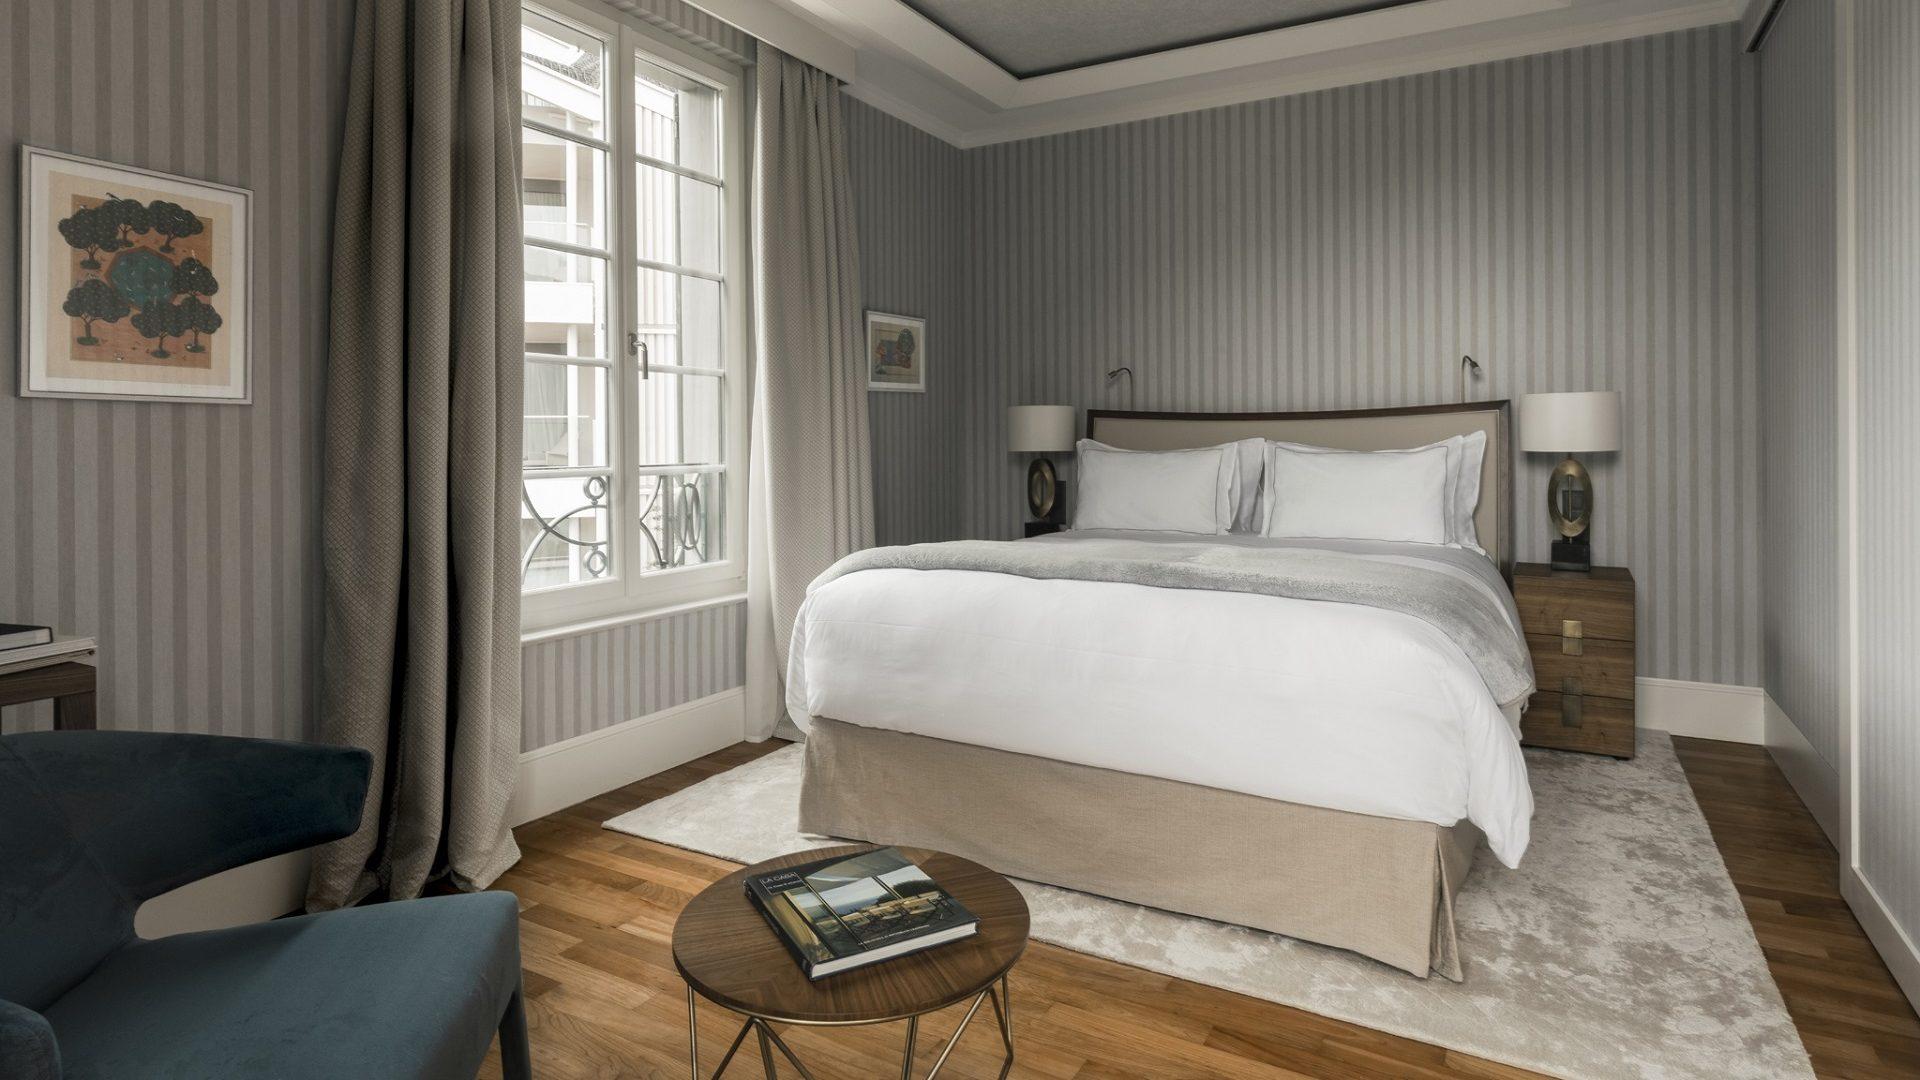 Chenot-Palace-Weggis_Single-Classic-Room_1920px.jpg